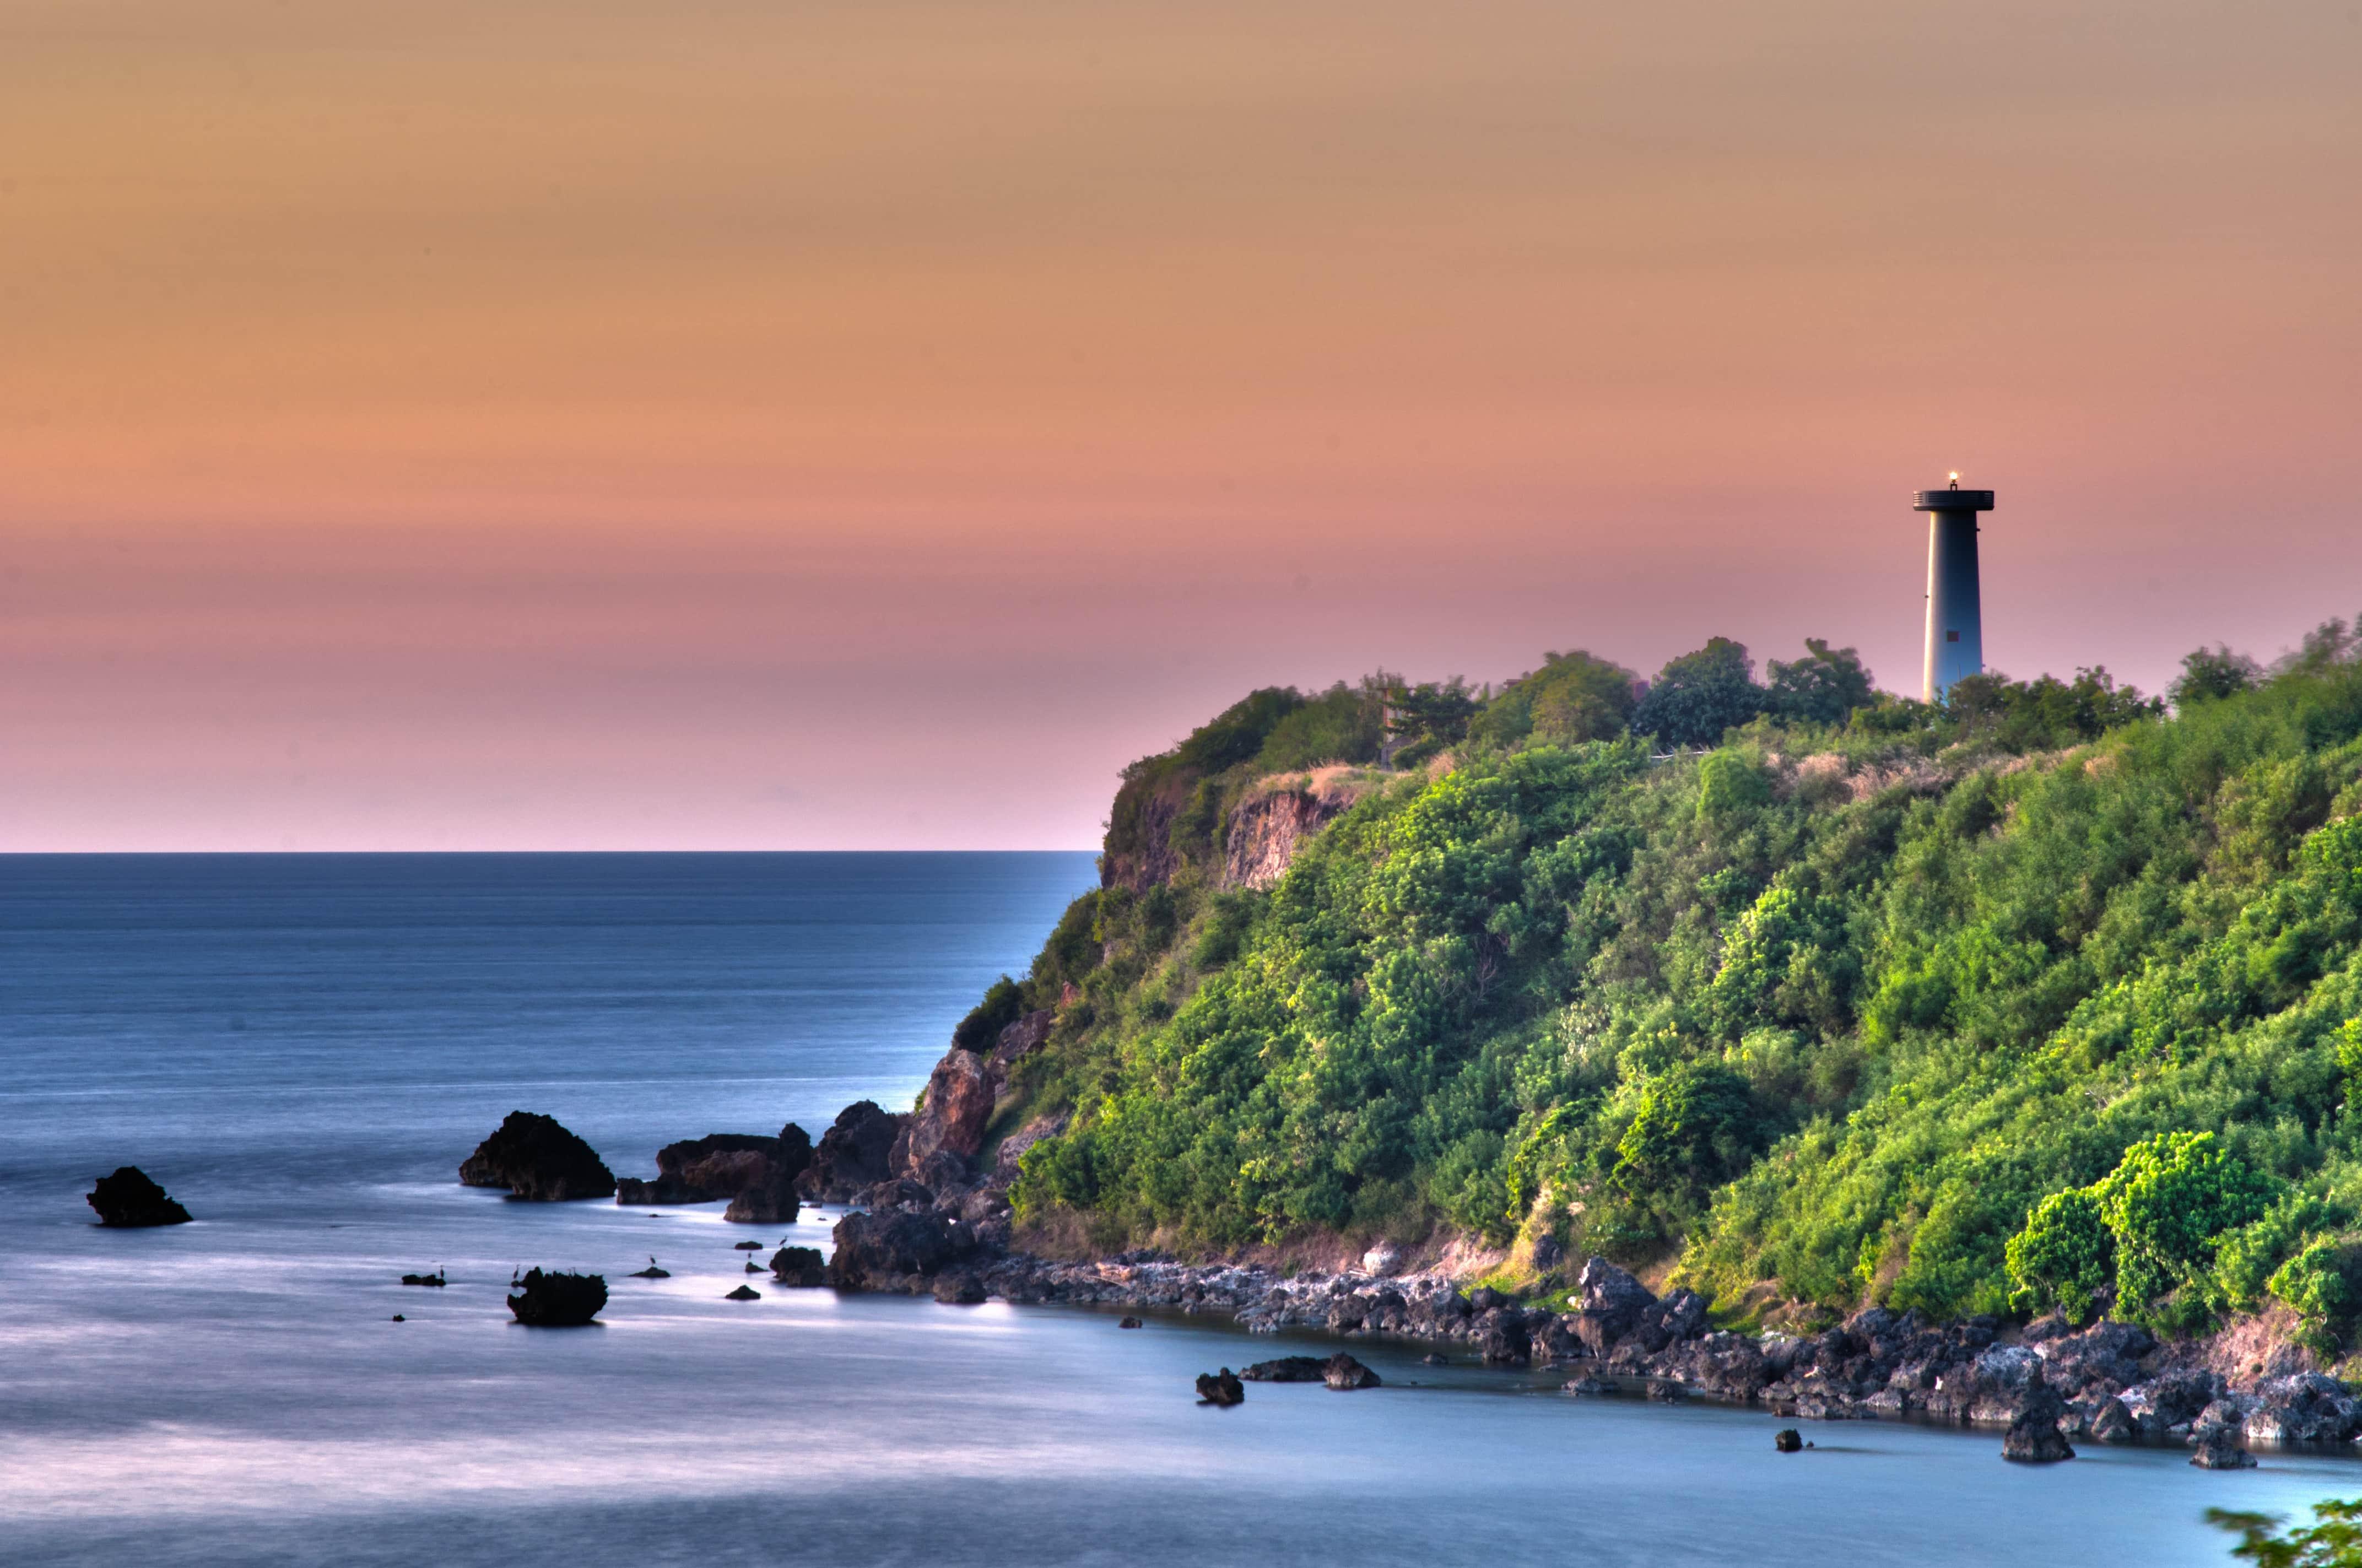 La Union tourist spots, La Union travel guide, Poro Point lighthouse, La Union itinerary